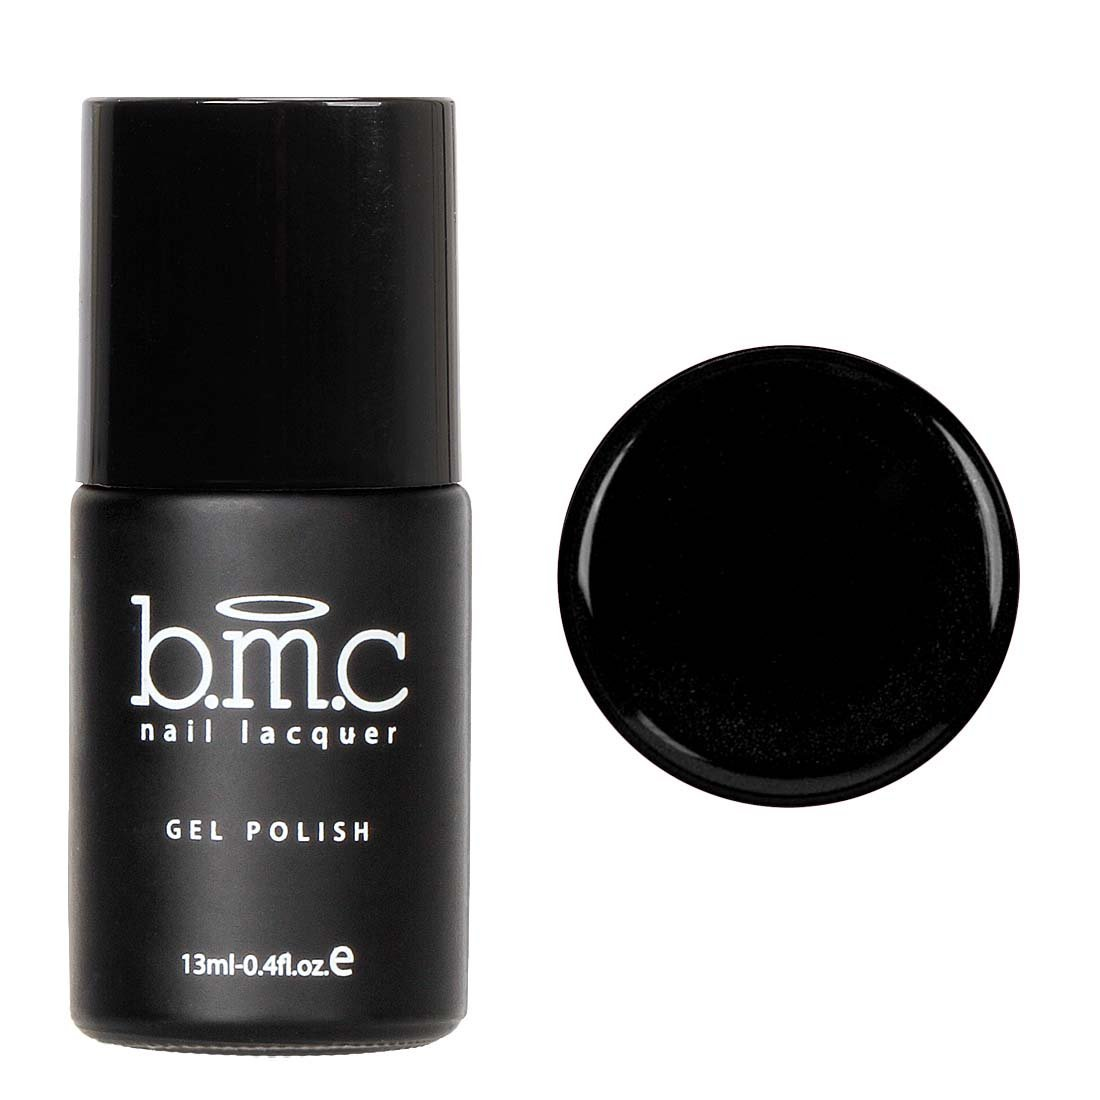 BMC Fashionably Classic Noir Black UV/LED Cream One-Step Speed Gel Nail Polish - Fundamentals, Cocktail Dress